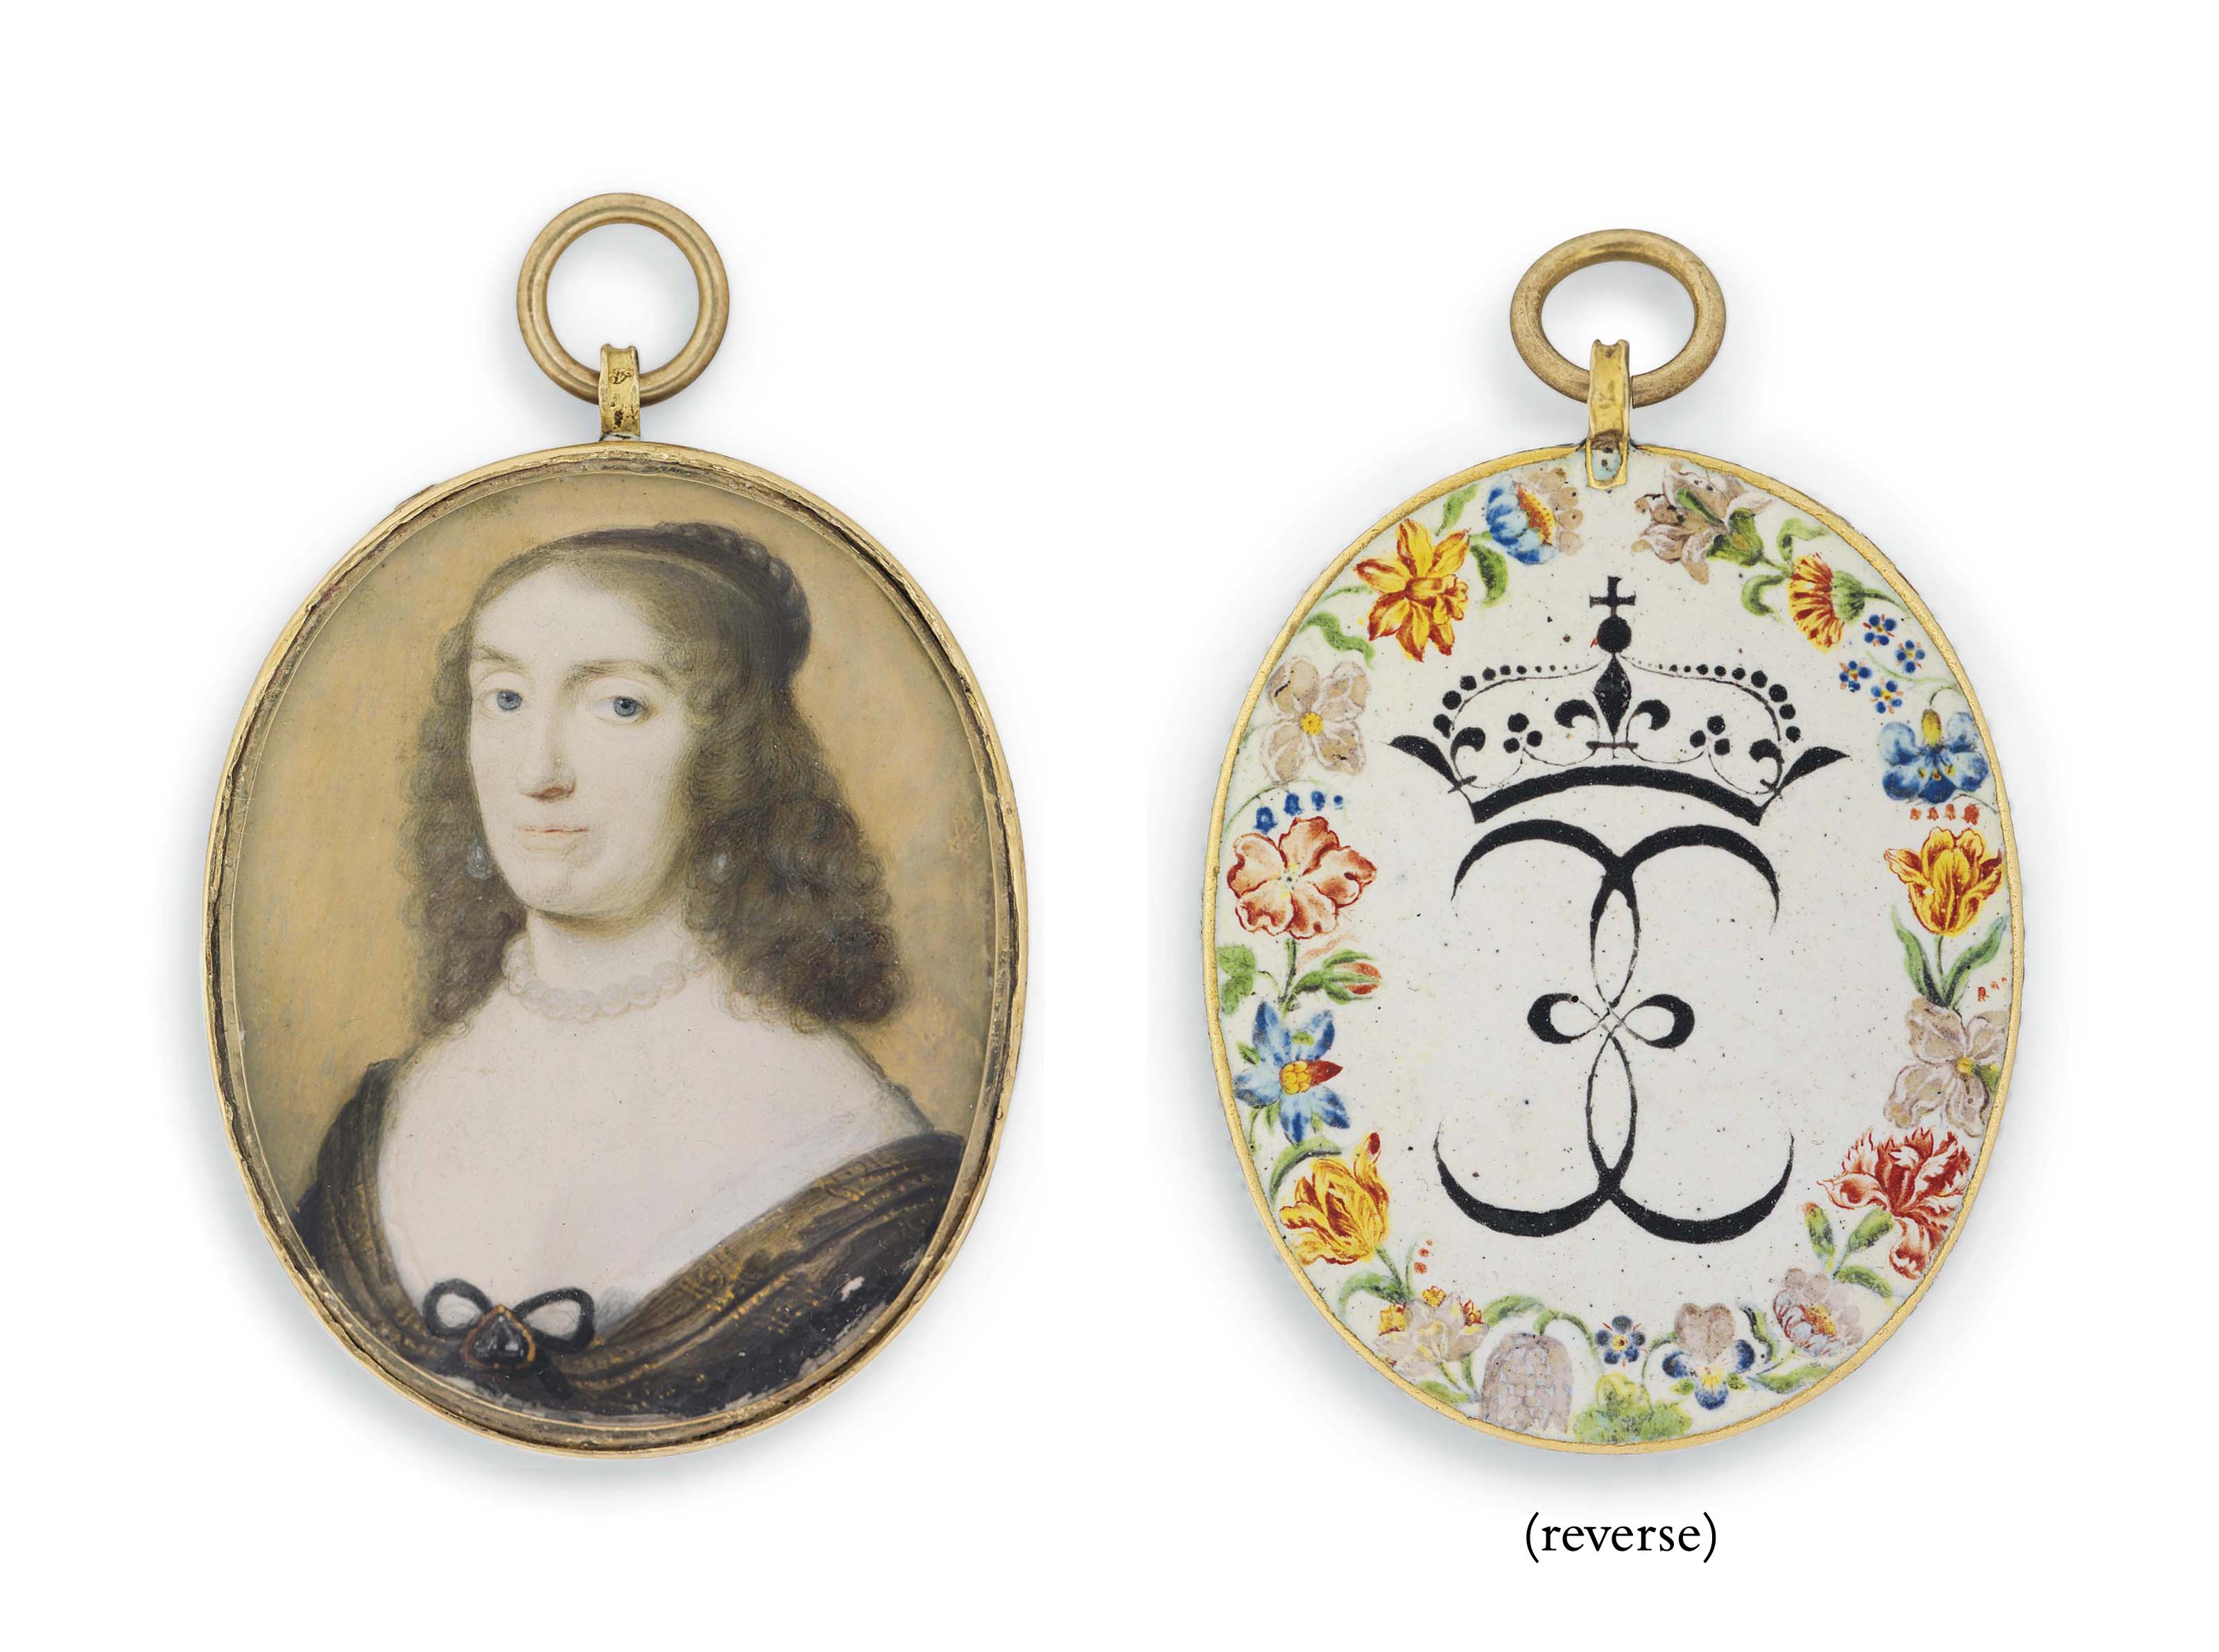 ALEXANDER COOPER (BRITISH, 1605-1669)